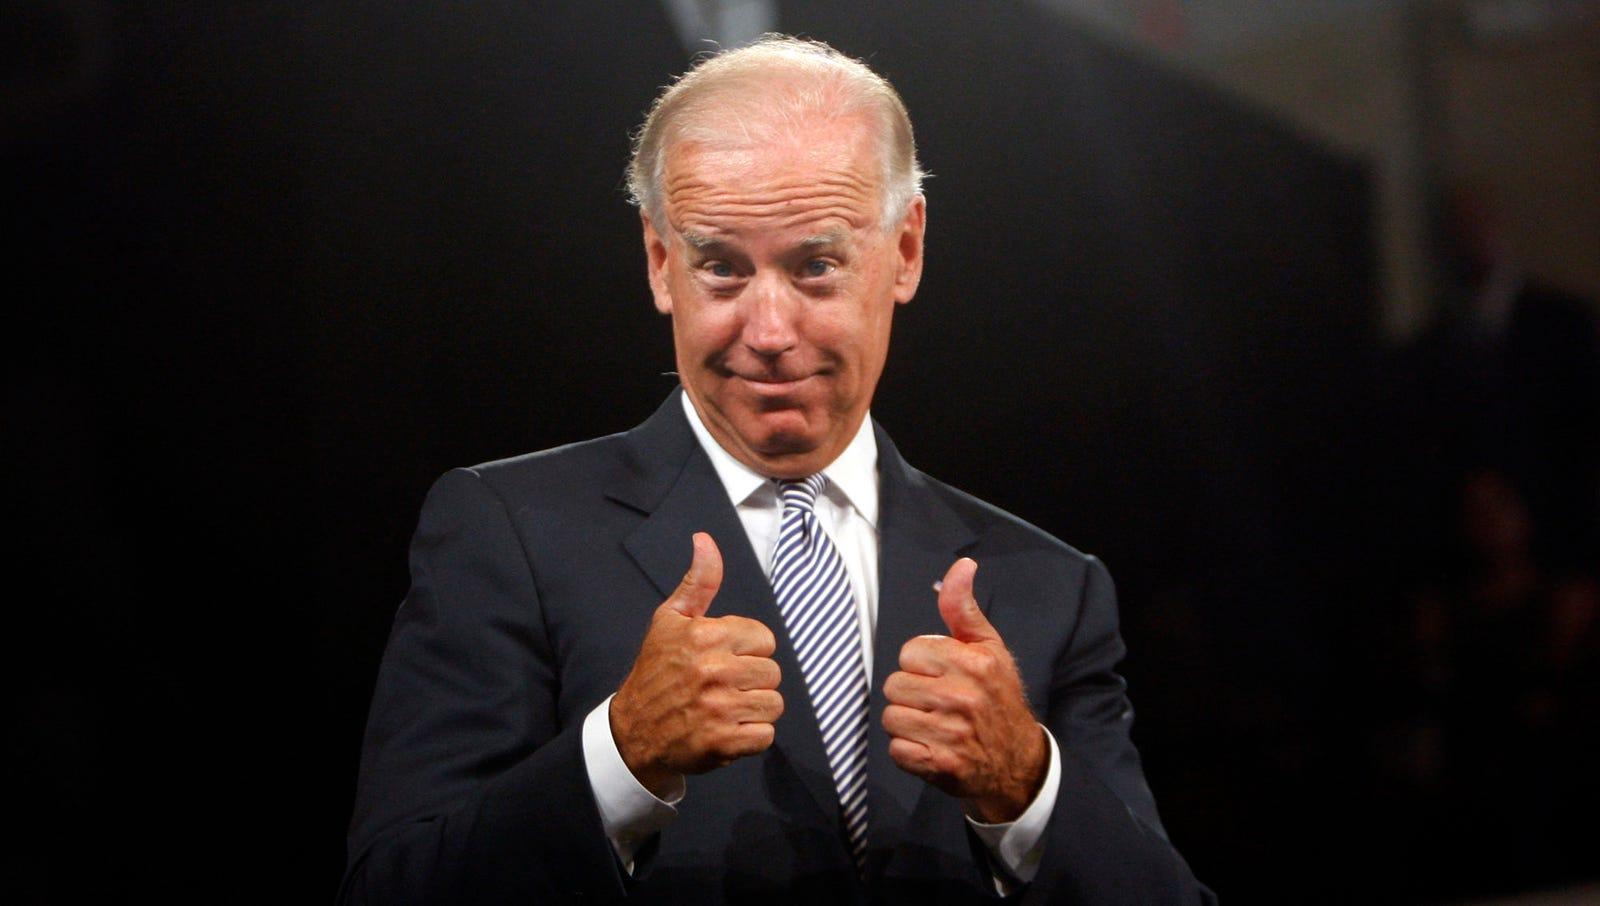 Biden Implores Obama To 'Rub One Out' Before Debate